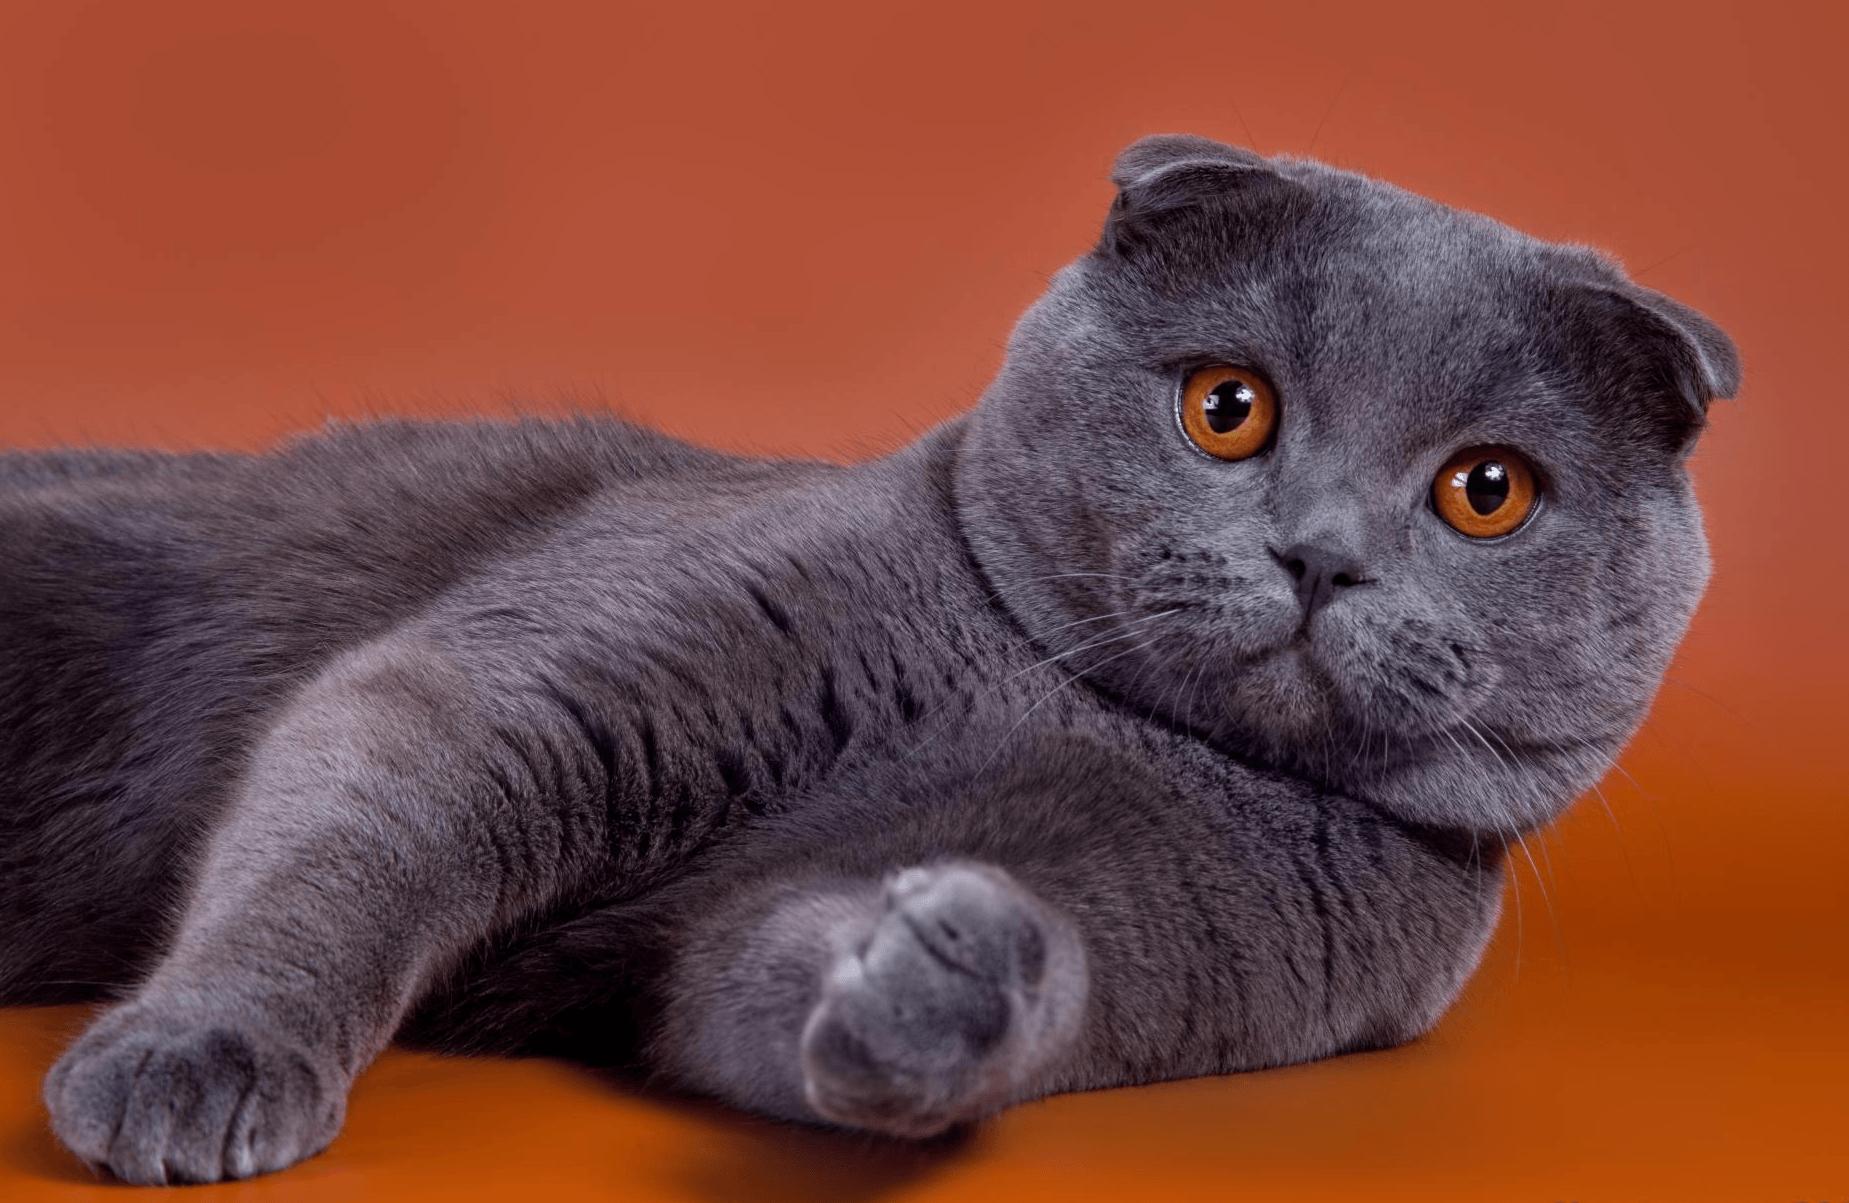 картинки котят вислоухих британцев серые имеет ранние сроки